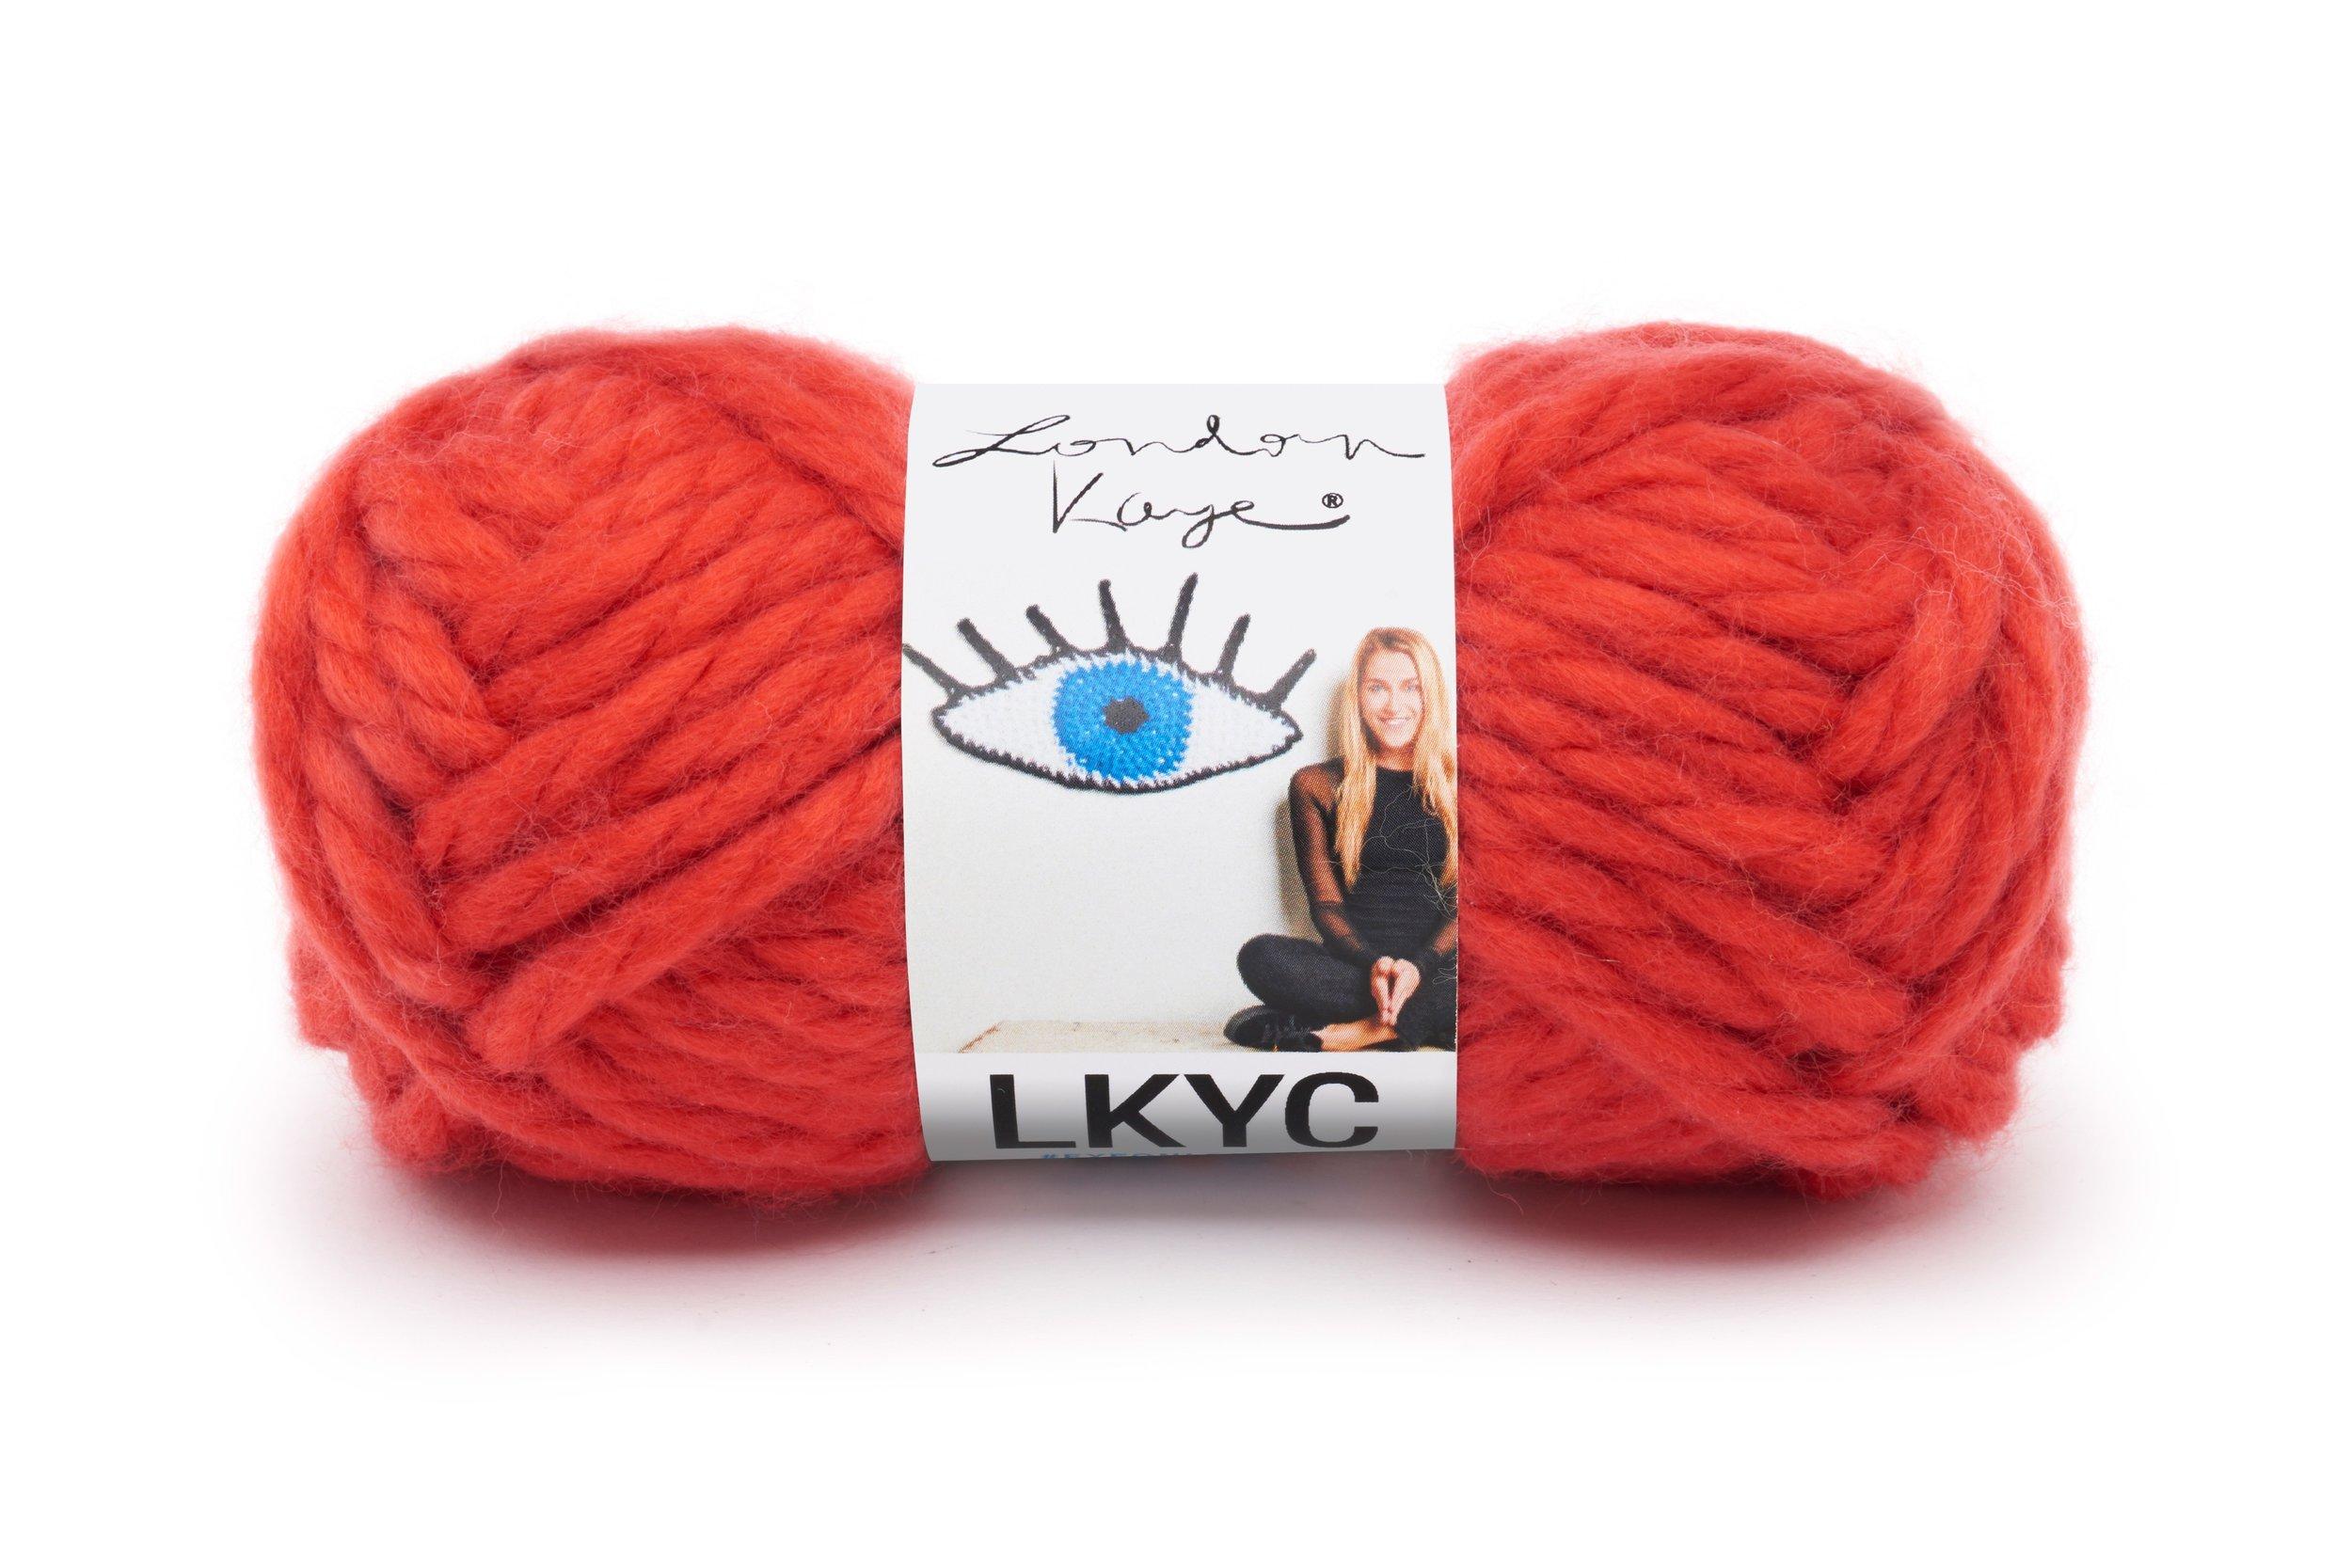 London Kaye Lipstick.jpg